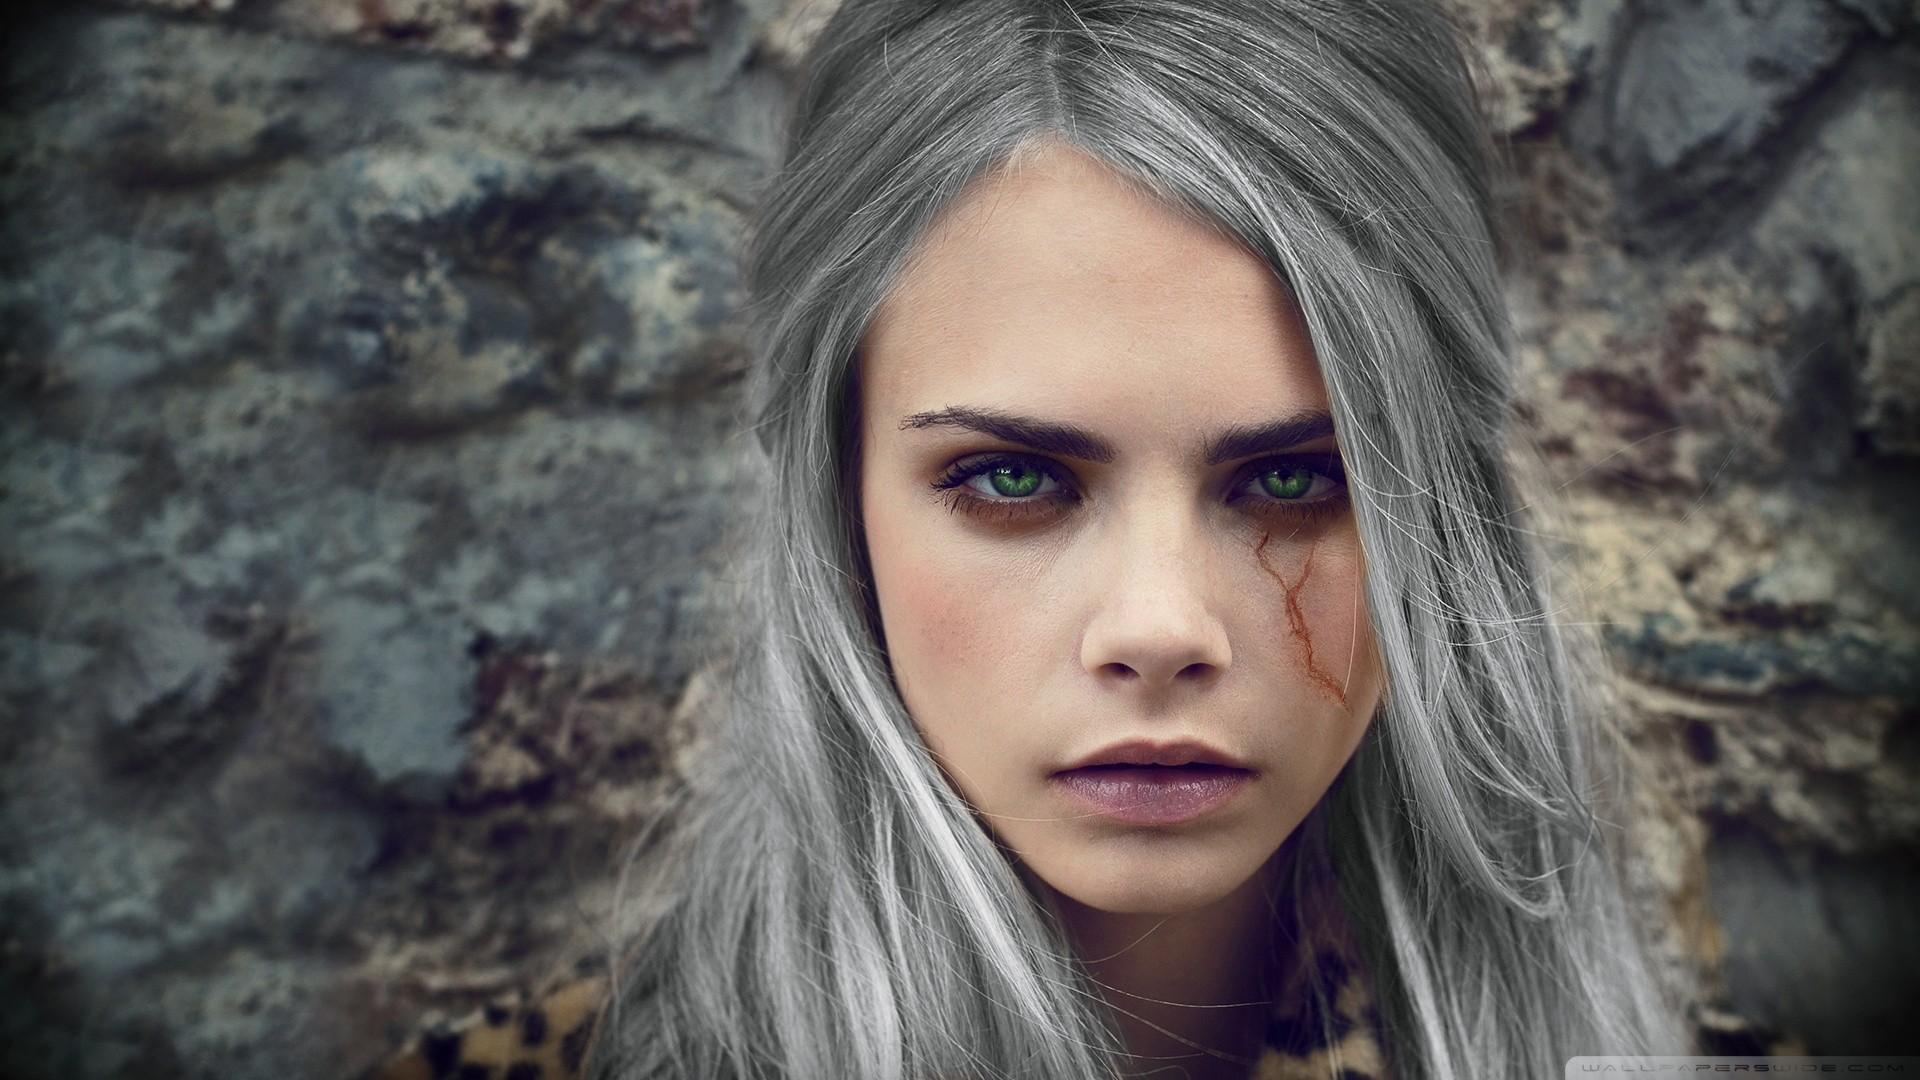 People 1920x1080 The Witcher 3: Wild Hunt cosplay Cara Delevingne women face portrait green eyes scars beige Ciri Cirilla